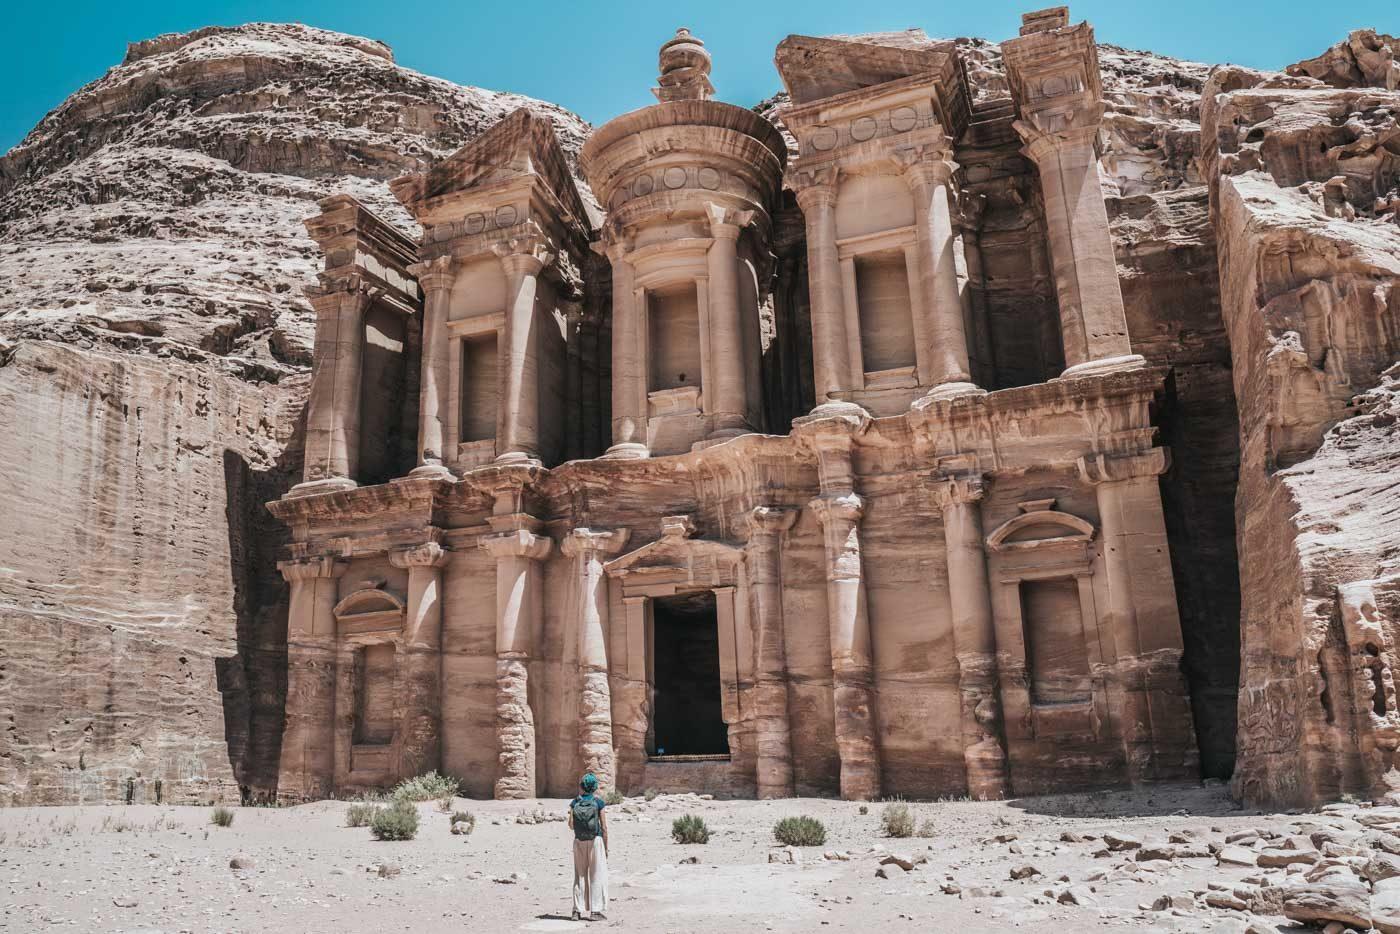 Jordan Tour: The Monastery at Petra, Jordan